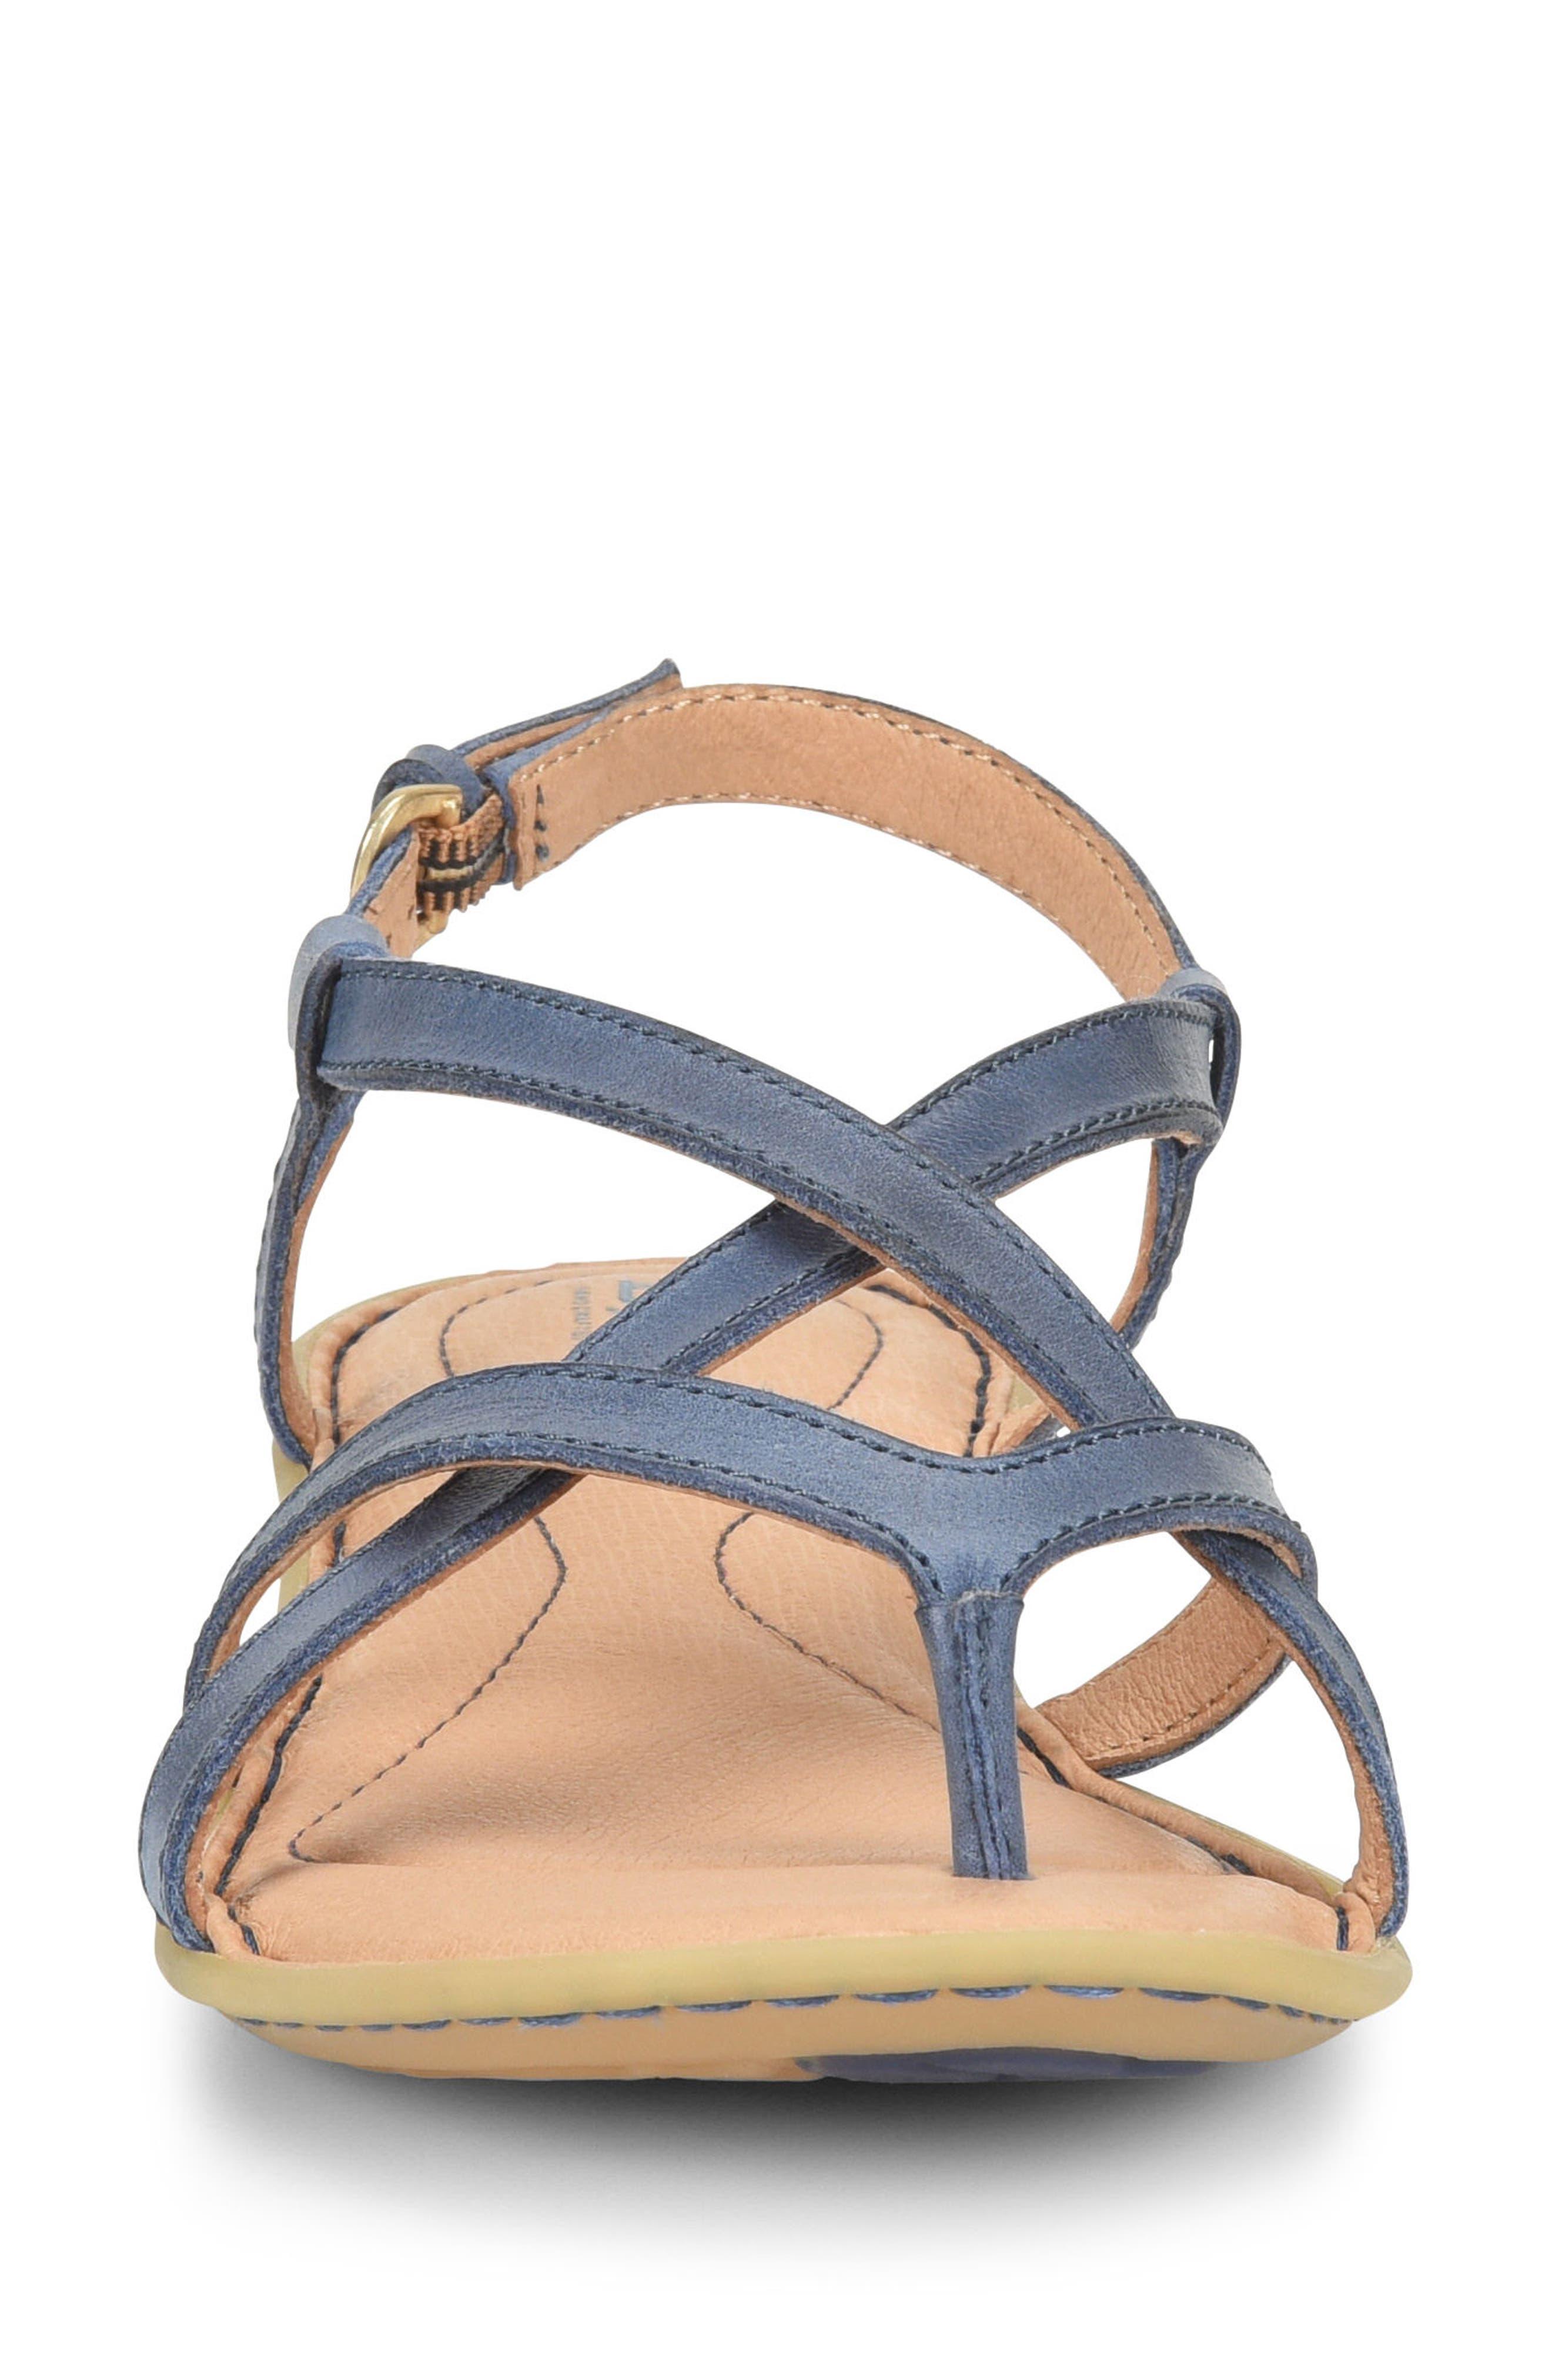 Mai Strap Sandal,                             Alternate thumbnail 4, color,                             Navy Leather